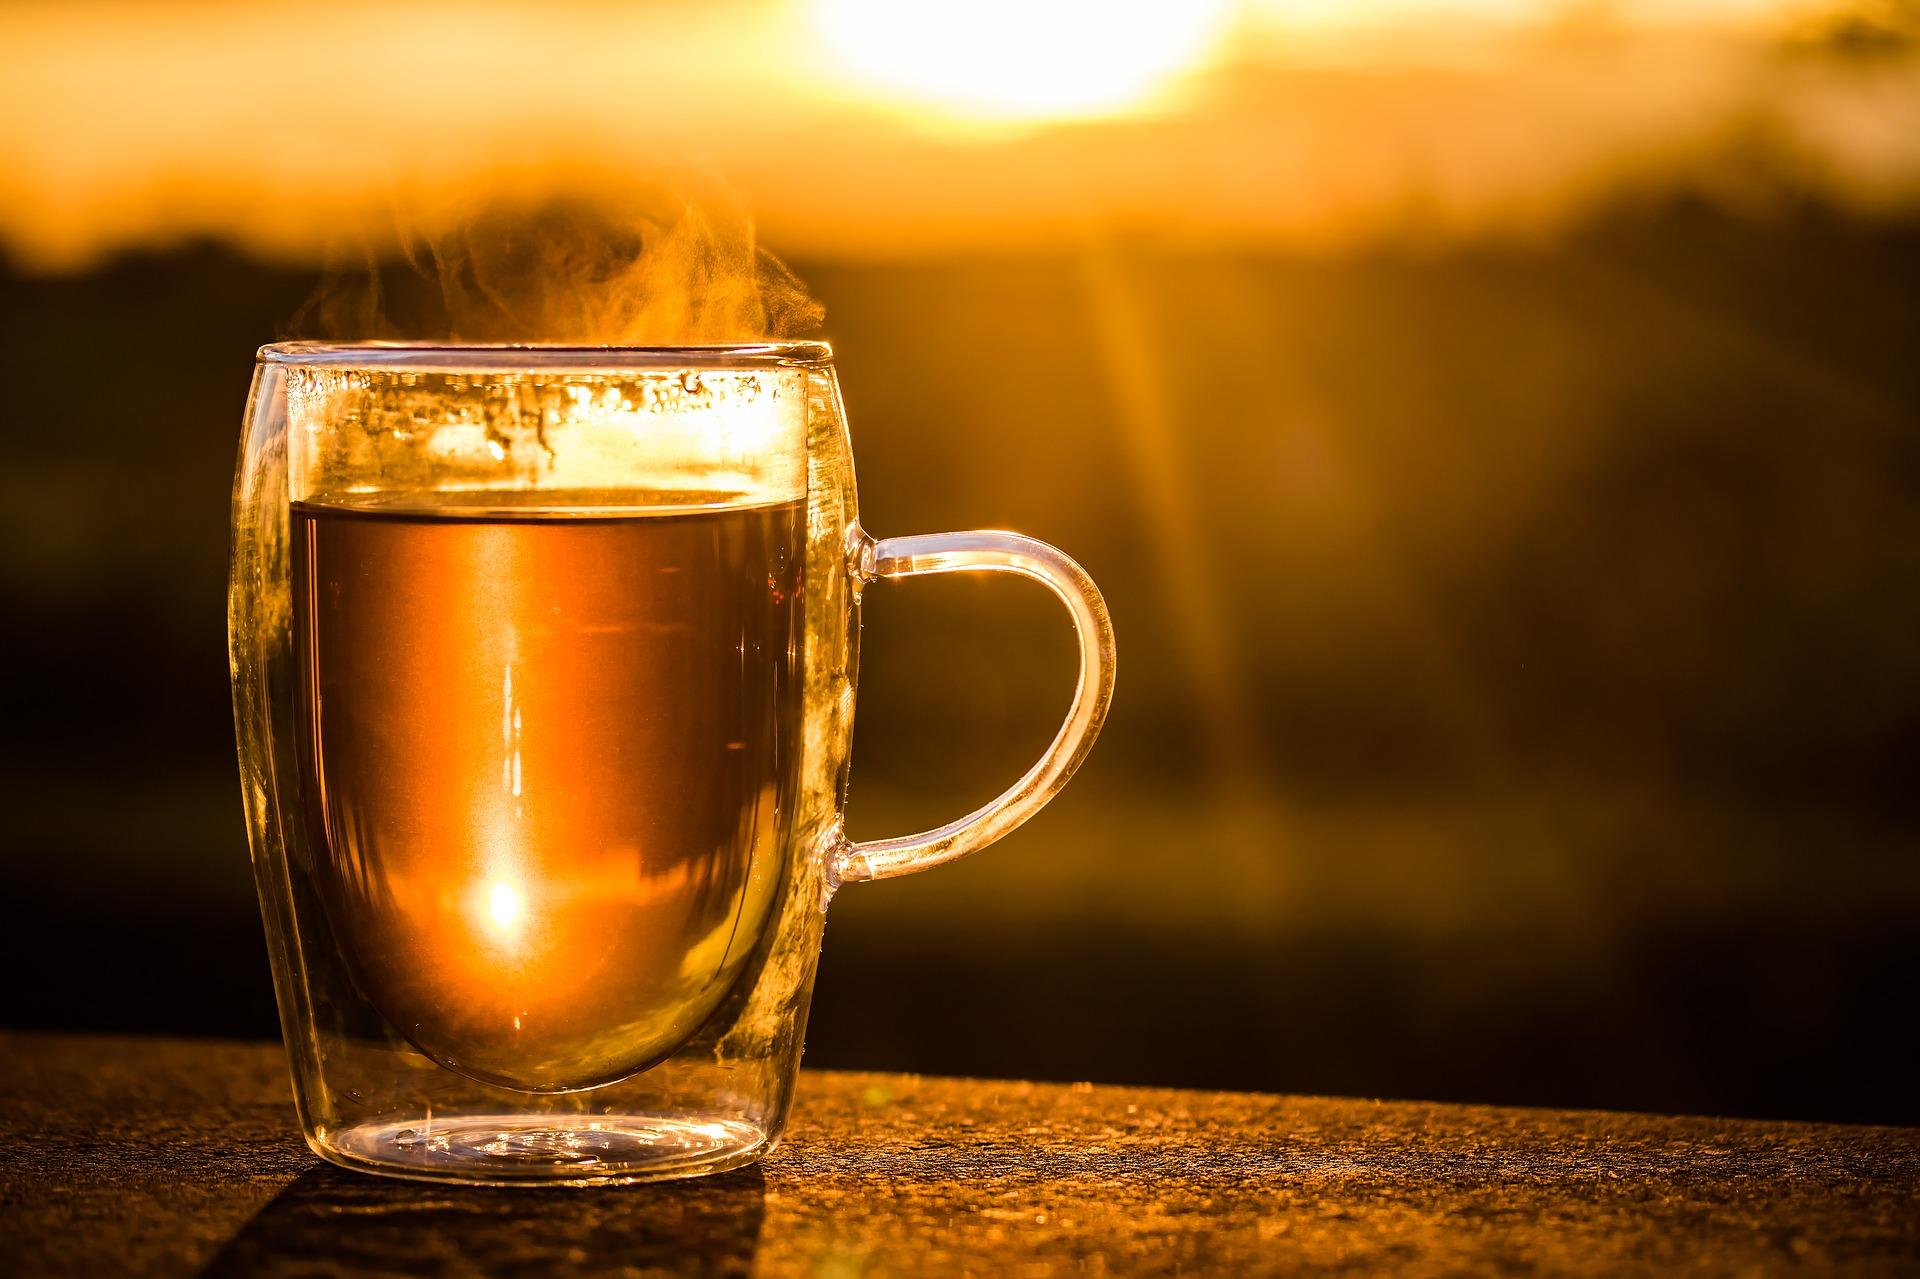 teacup-2324842_1920